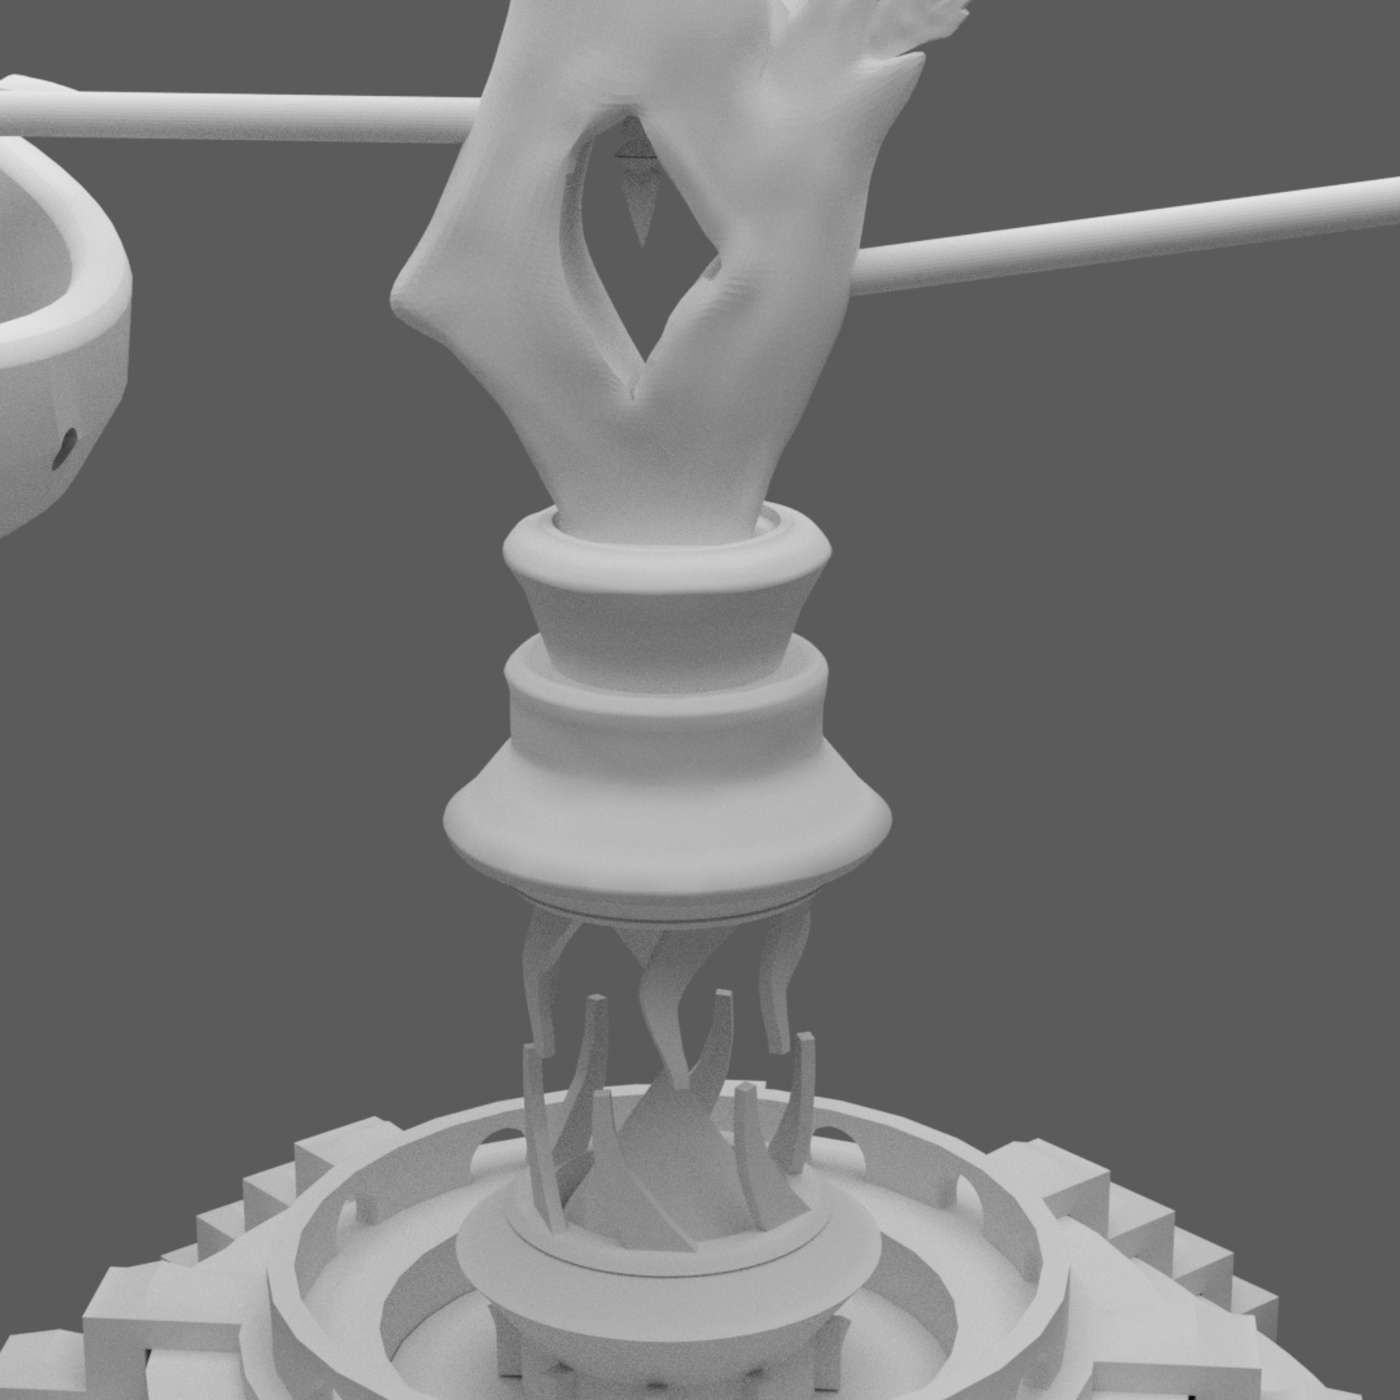 Final Fantasy Aetheryte Crystal printable